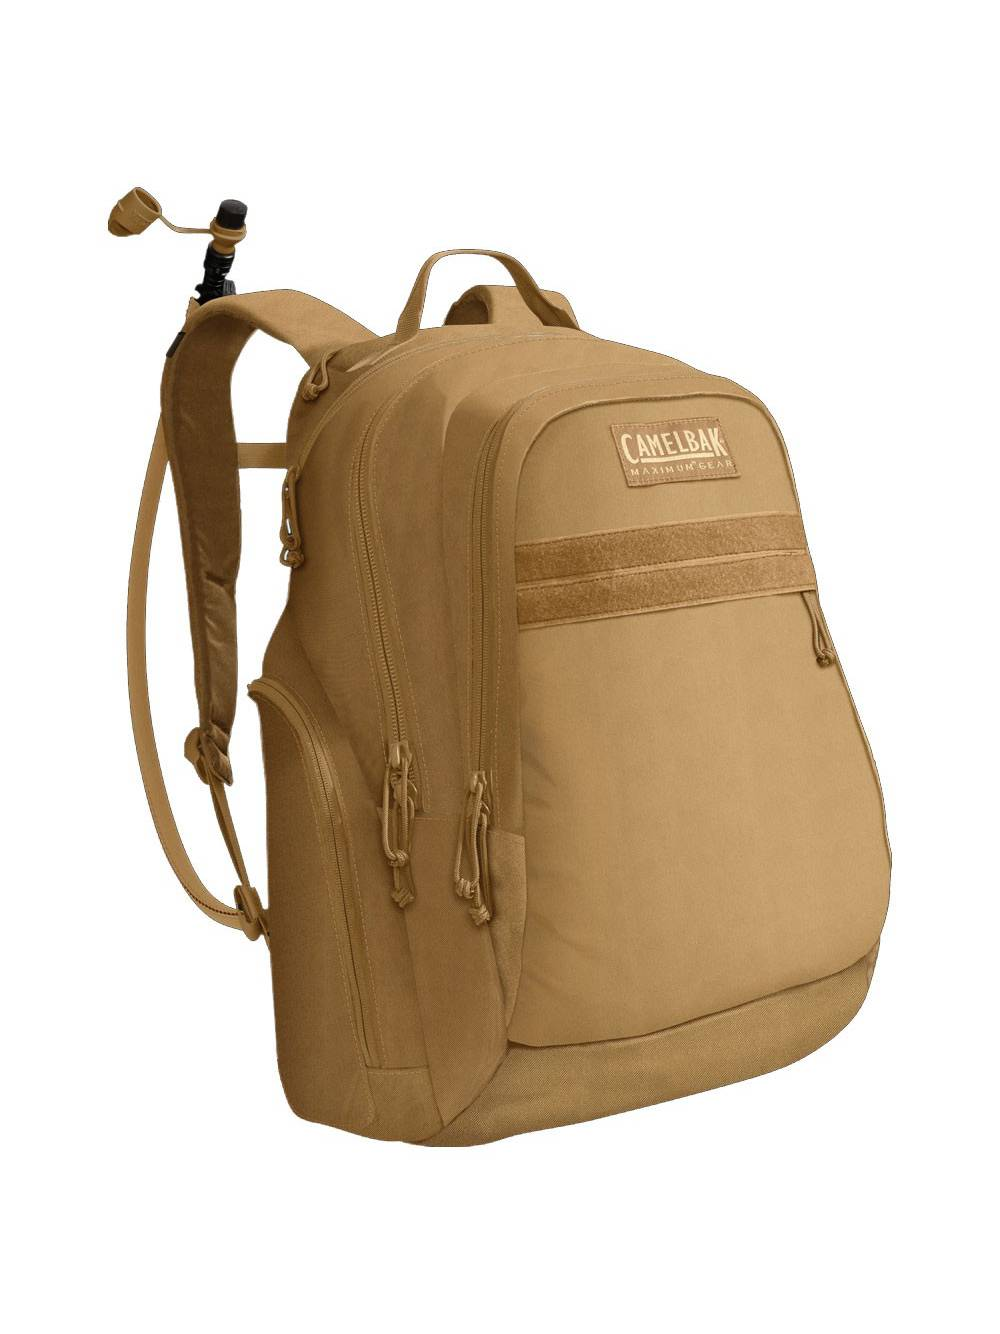 Camelbak Urban Transport Hydration Backpack 50 oz Coyote 61494 by CamelBak